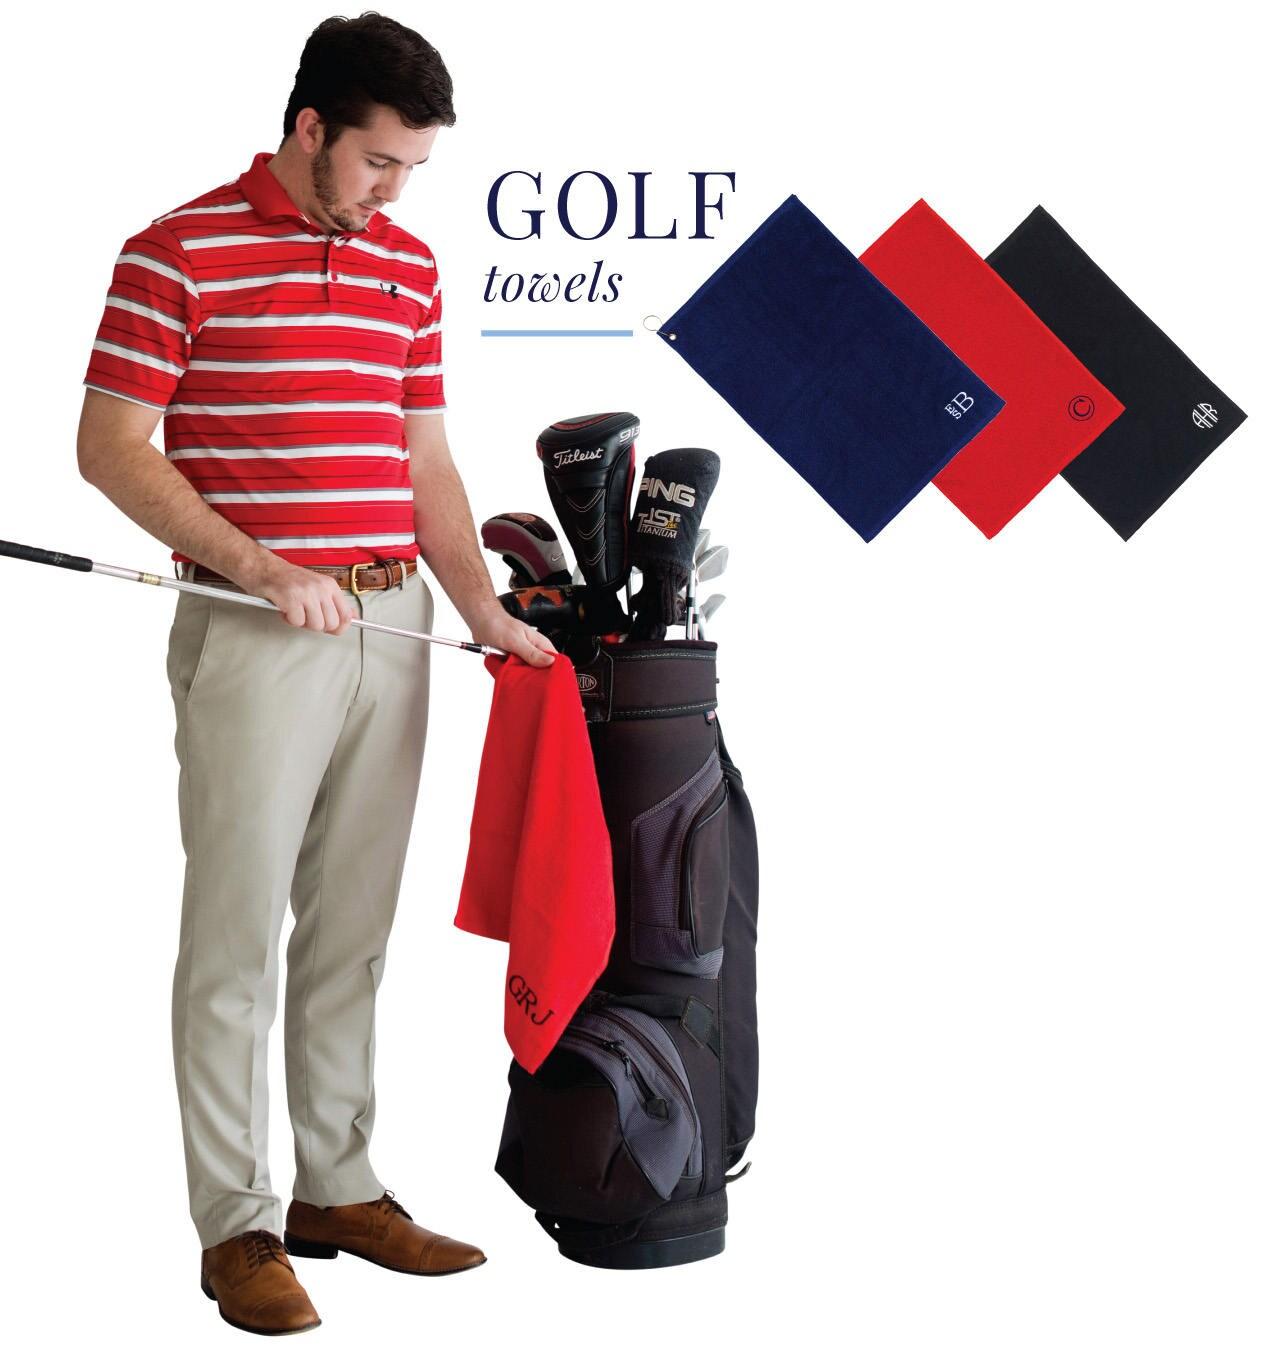 Monogrammed Golf Towels, Monogrammed Gifts, Monogram Golf